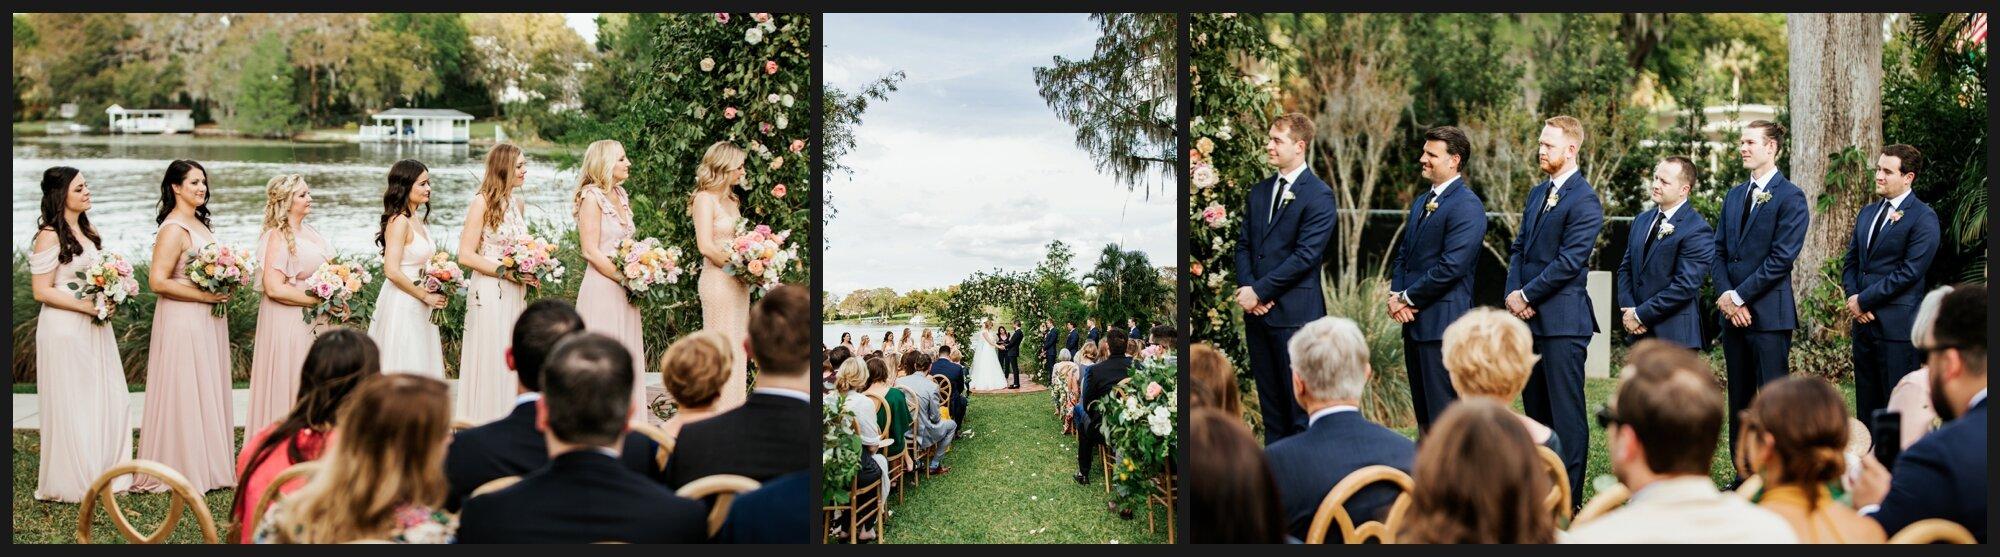 Orlando-Wedding-Photographer-destination-wedding-photographer-florida-wedding-photographer-hawaii-wedding-photographer_0707.jpg